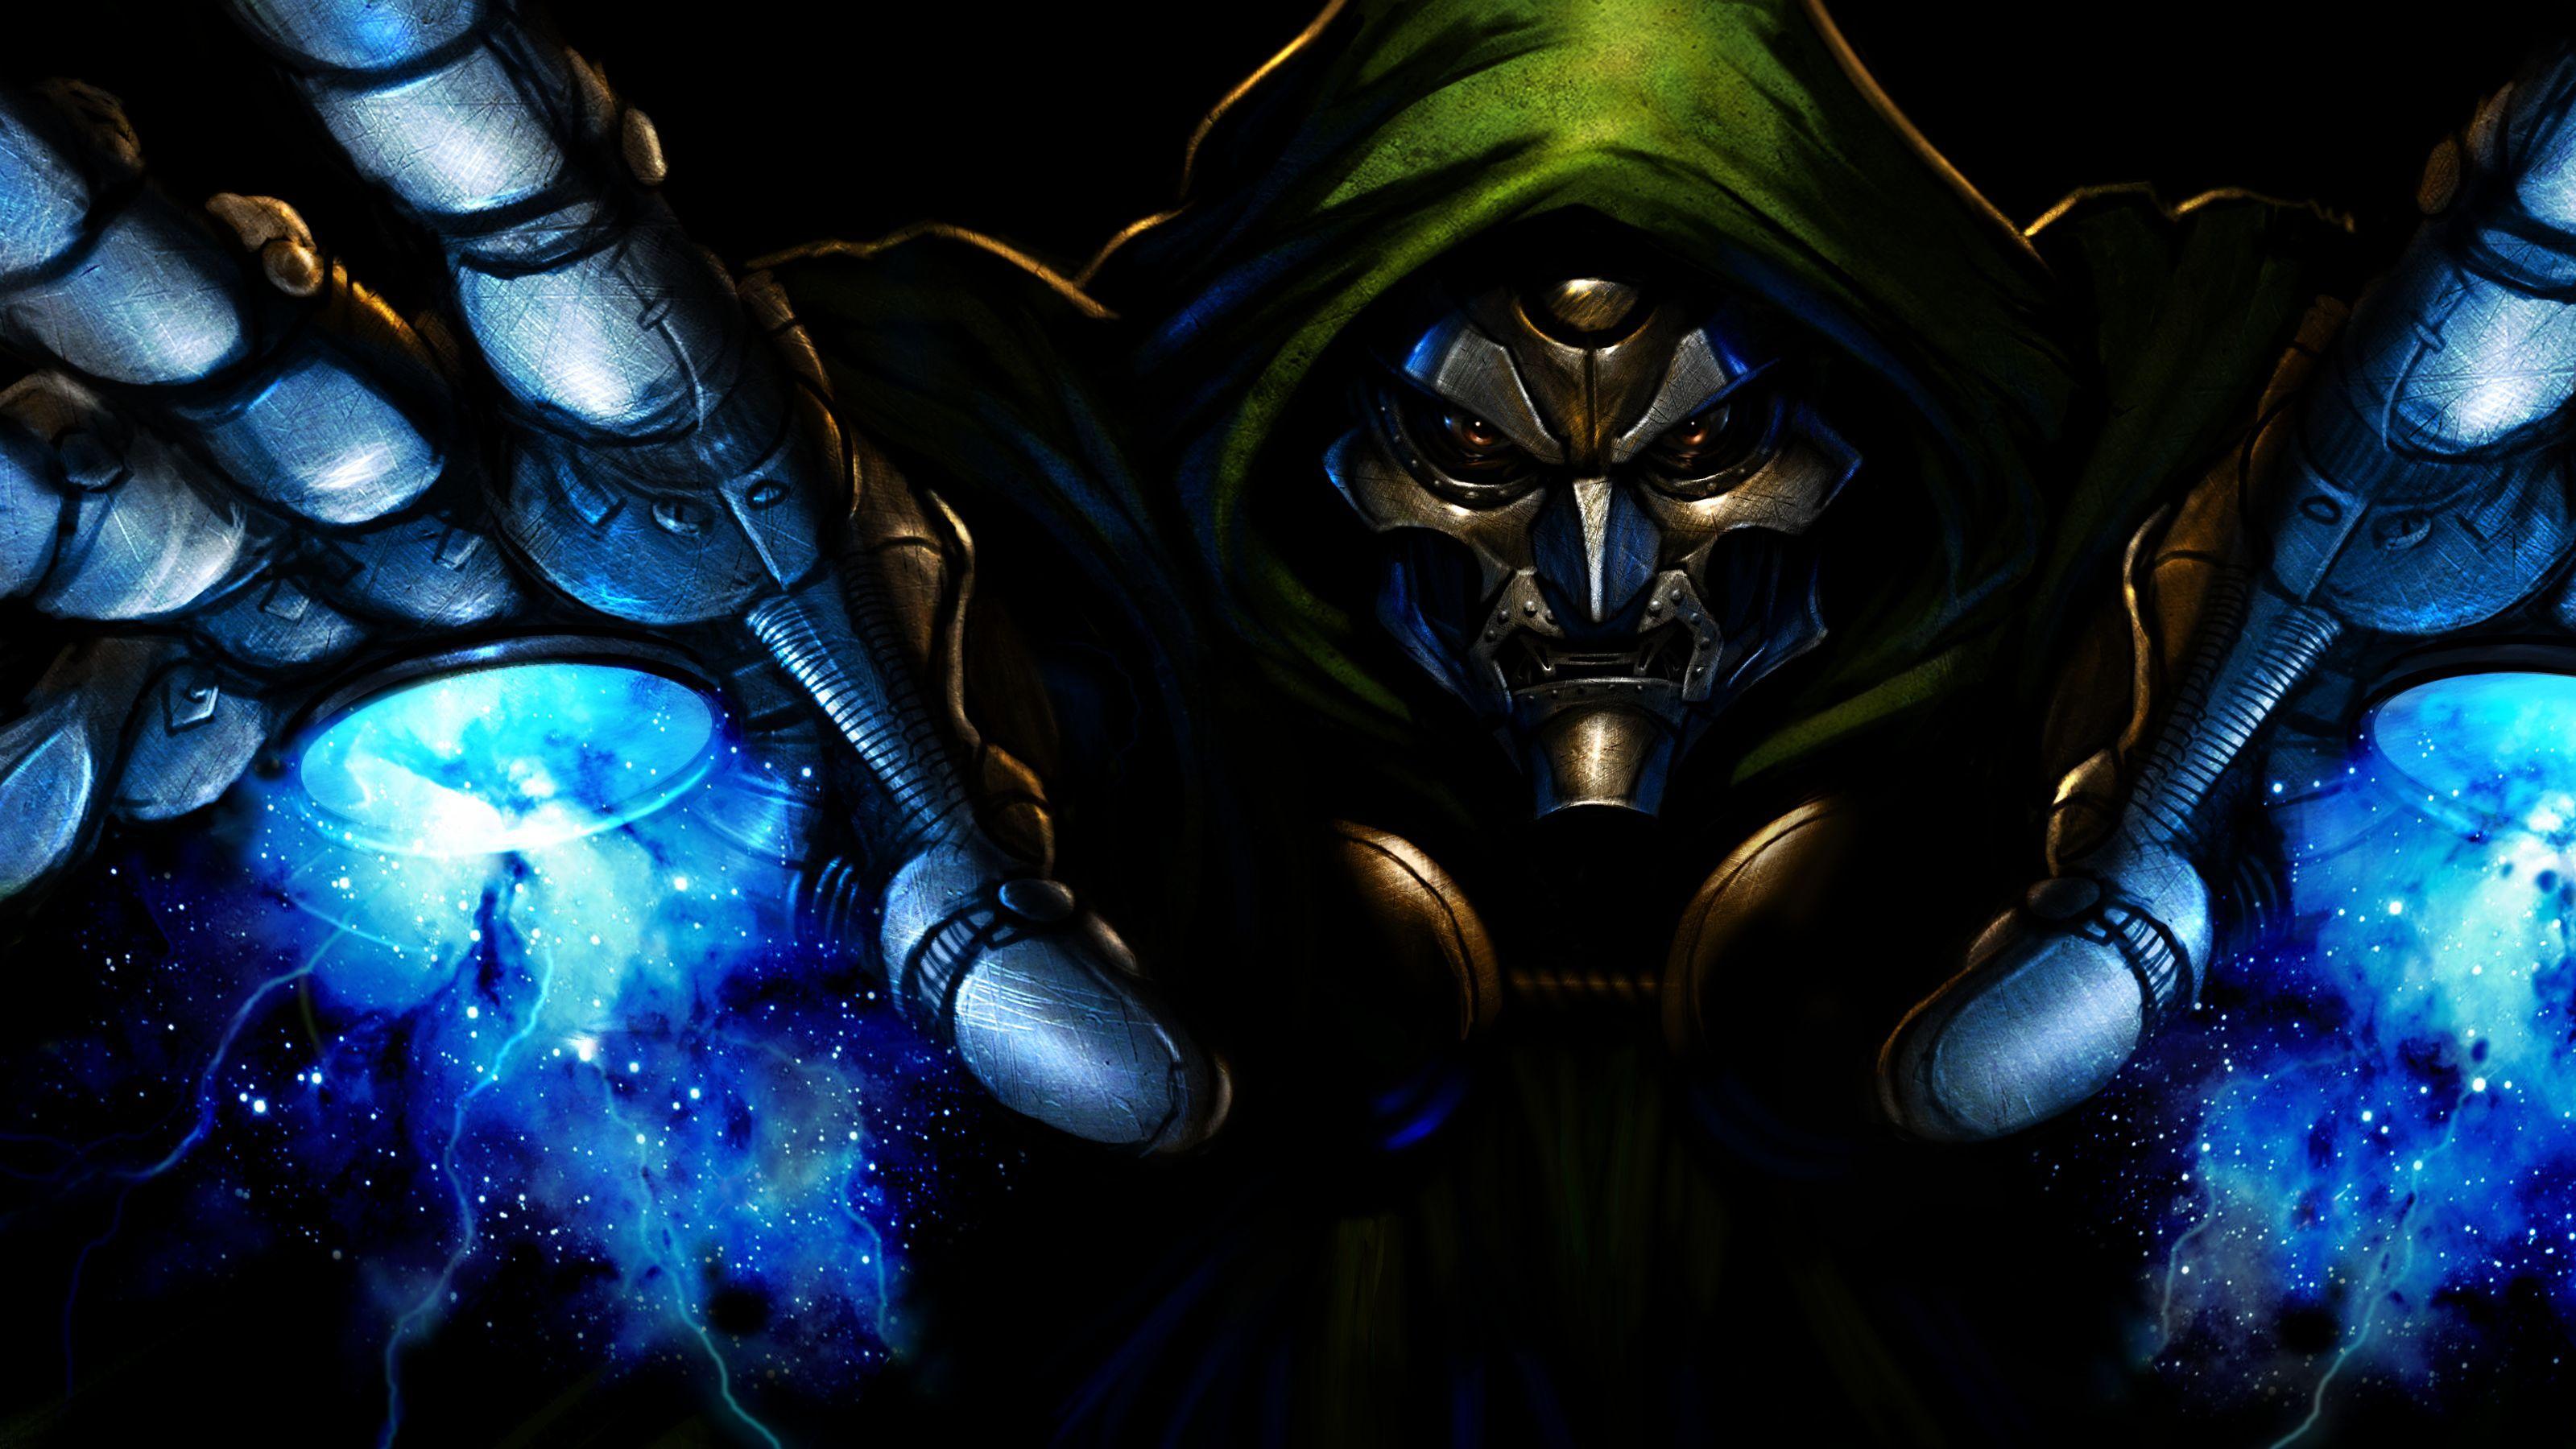 Dr. Doom Artwork (With images) Dc comics wallpaper